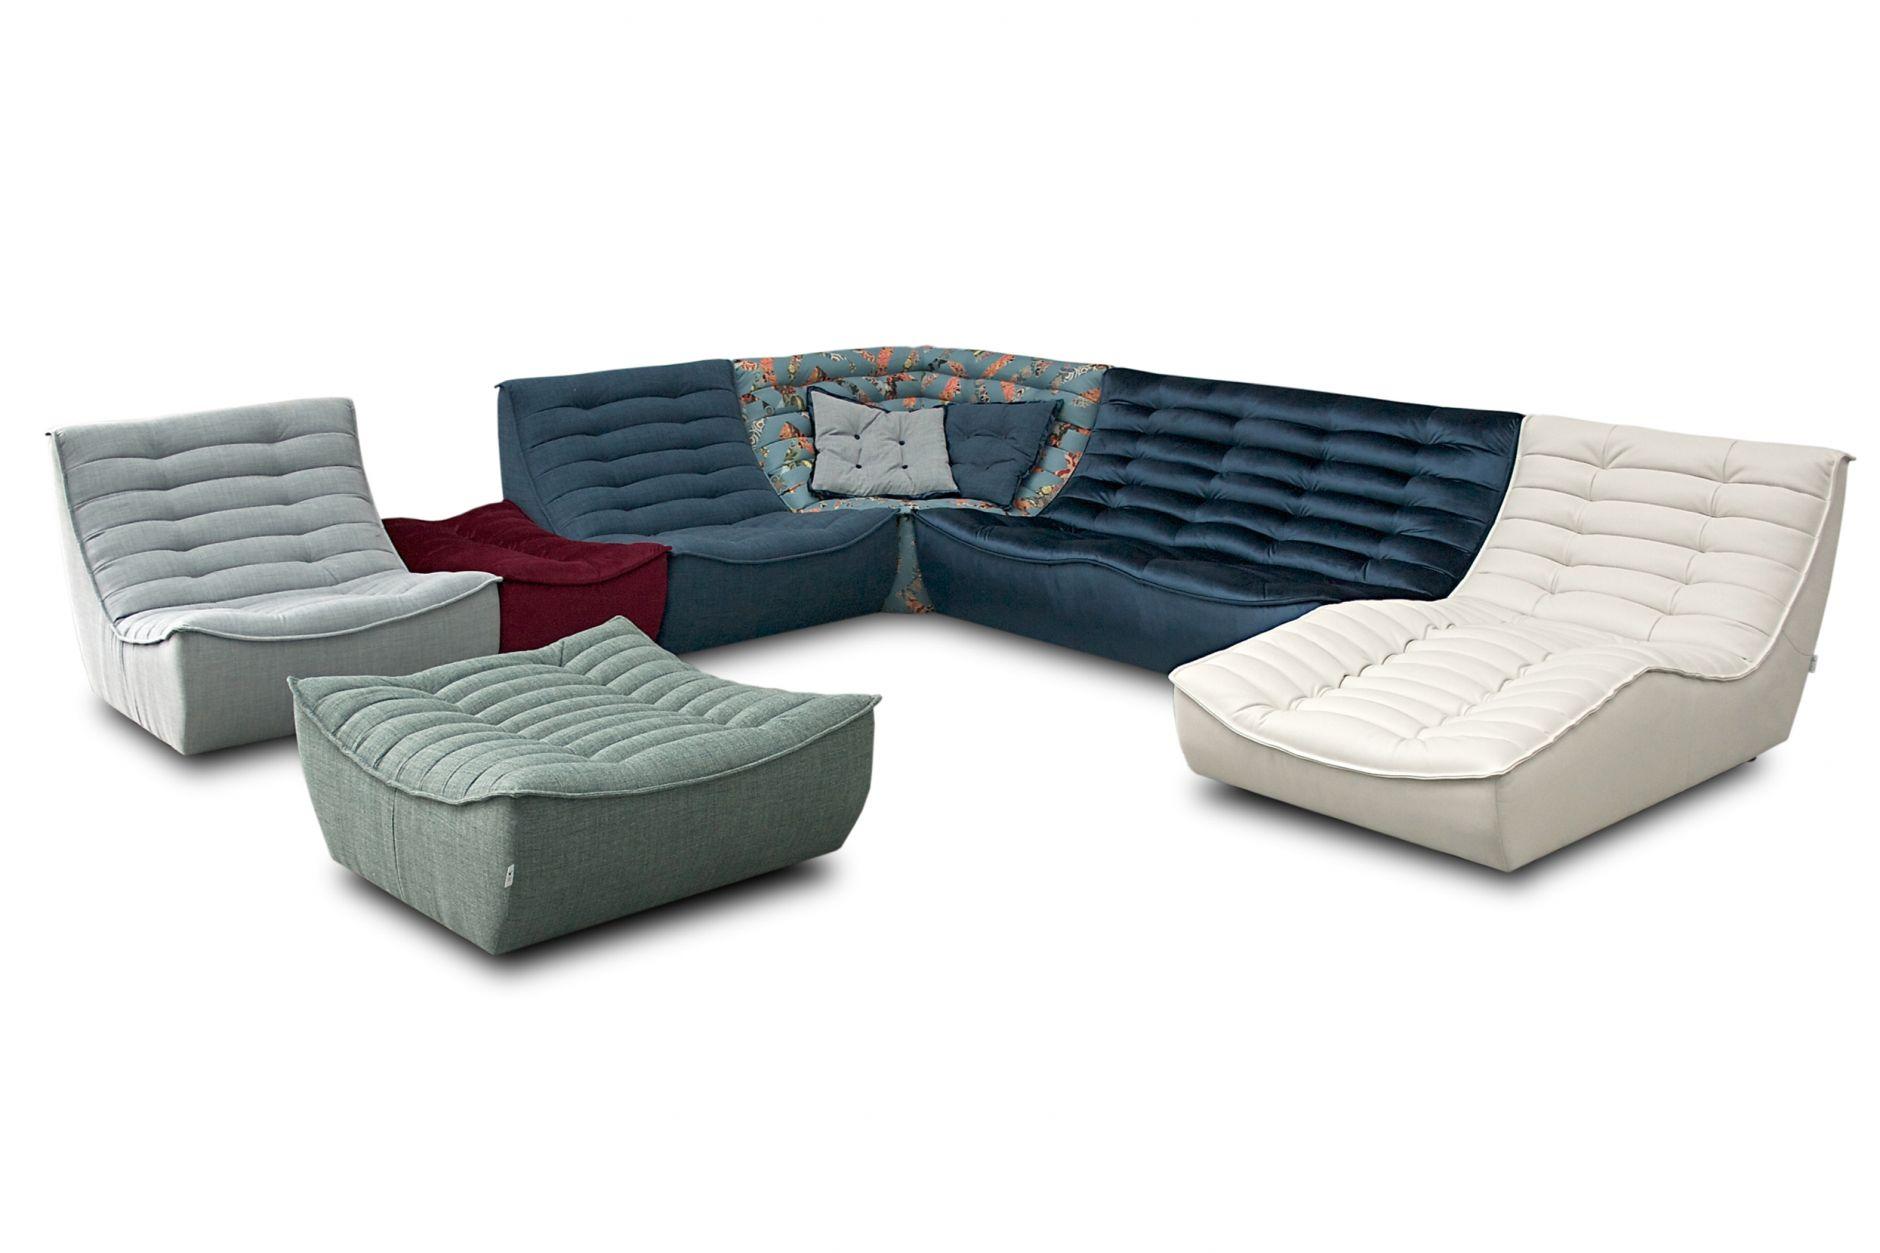 sectional sofas sectional sofa calia italia kalimba 1079. Black Bedroom Furniture Sets. Home Design Ideas